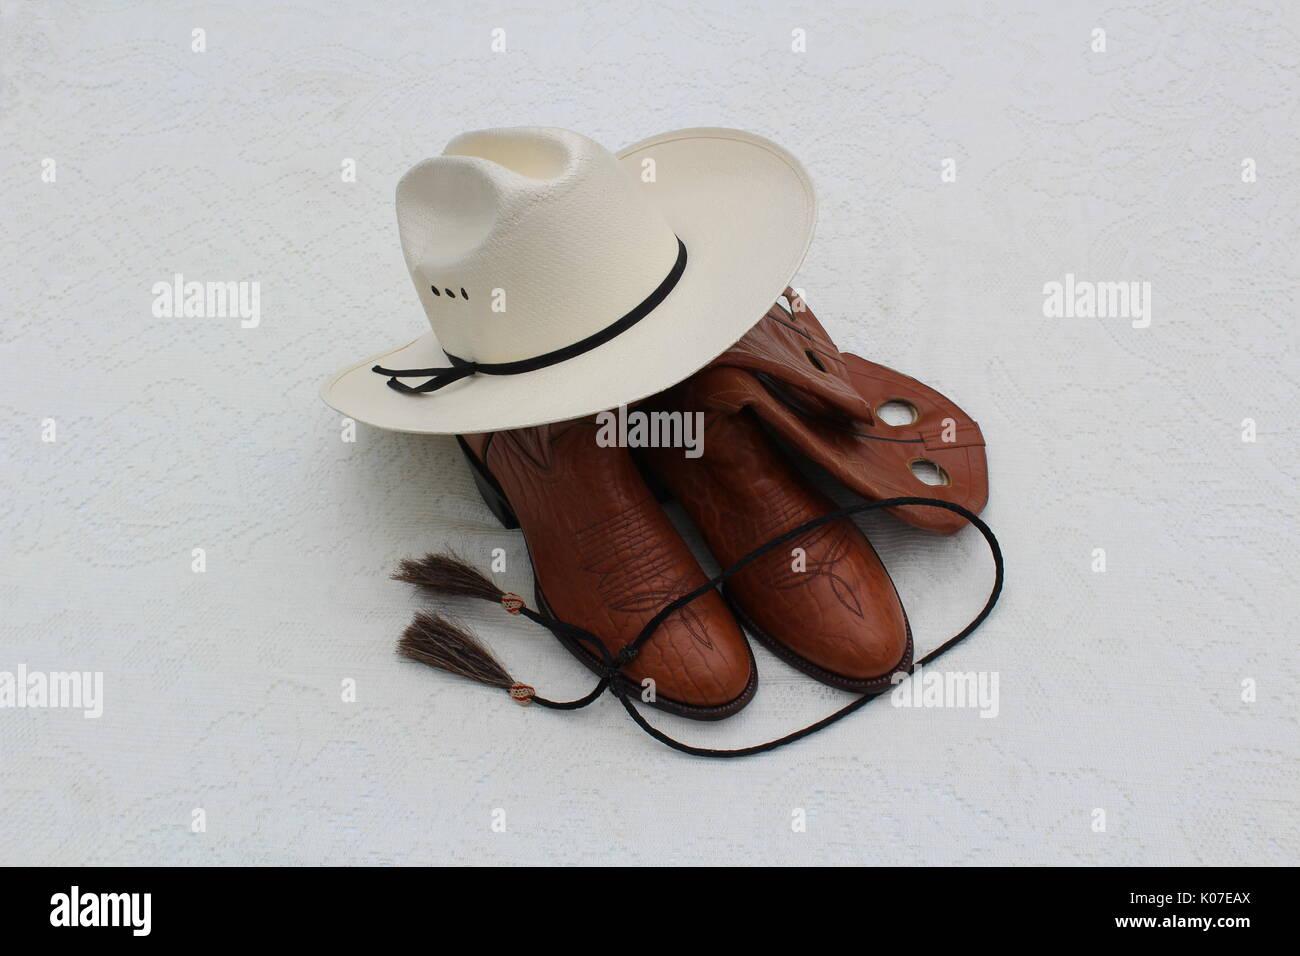 Cowboy Hat Cowboy Boots Bolo Tie - Stock Image